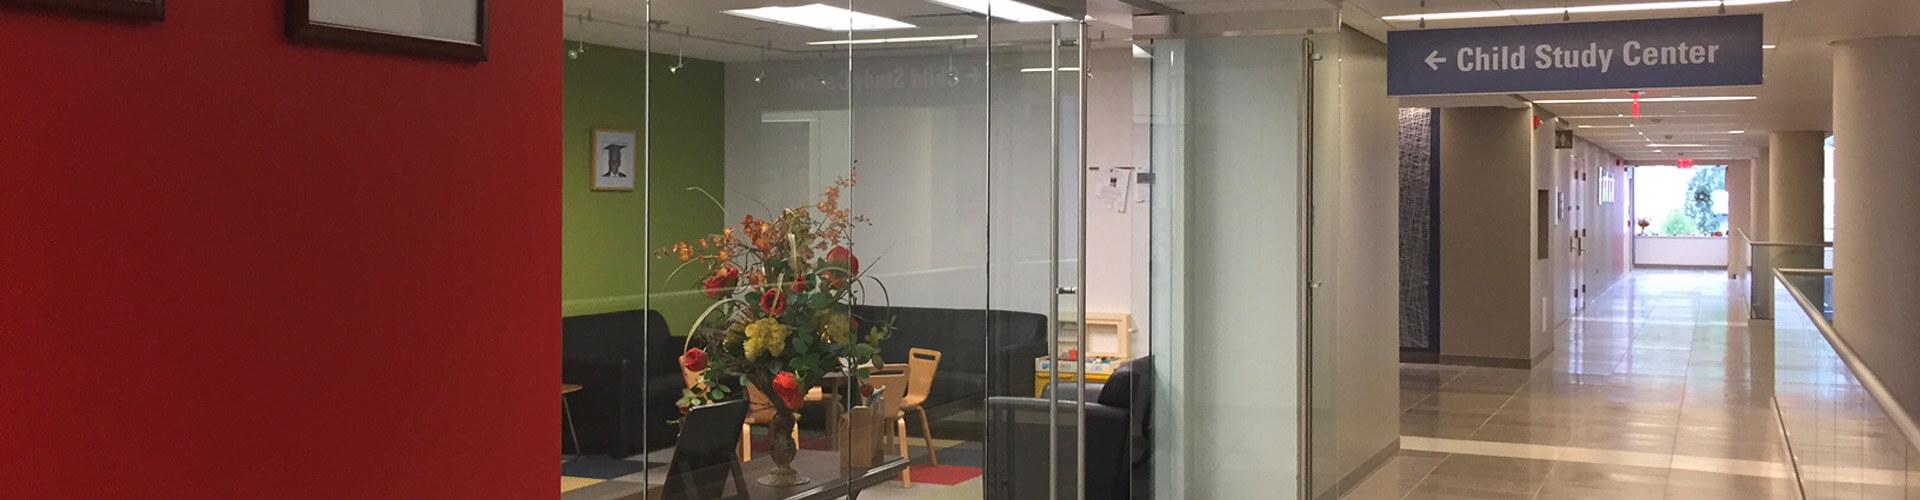 Child Study Center reception area